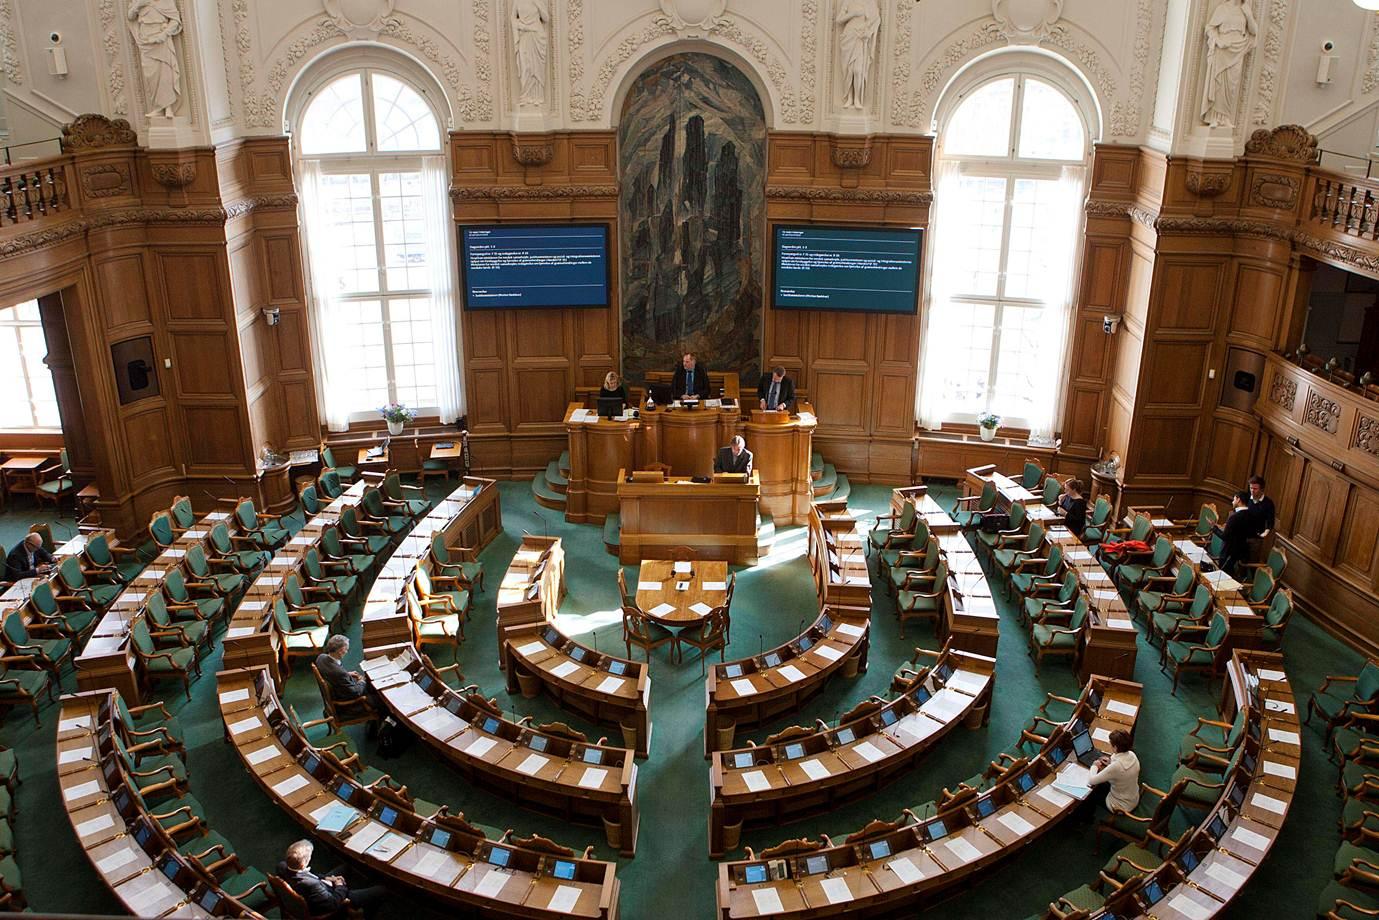 folkets parlament aalborg